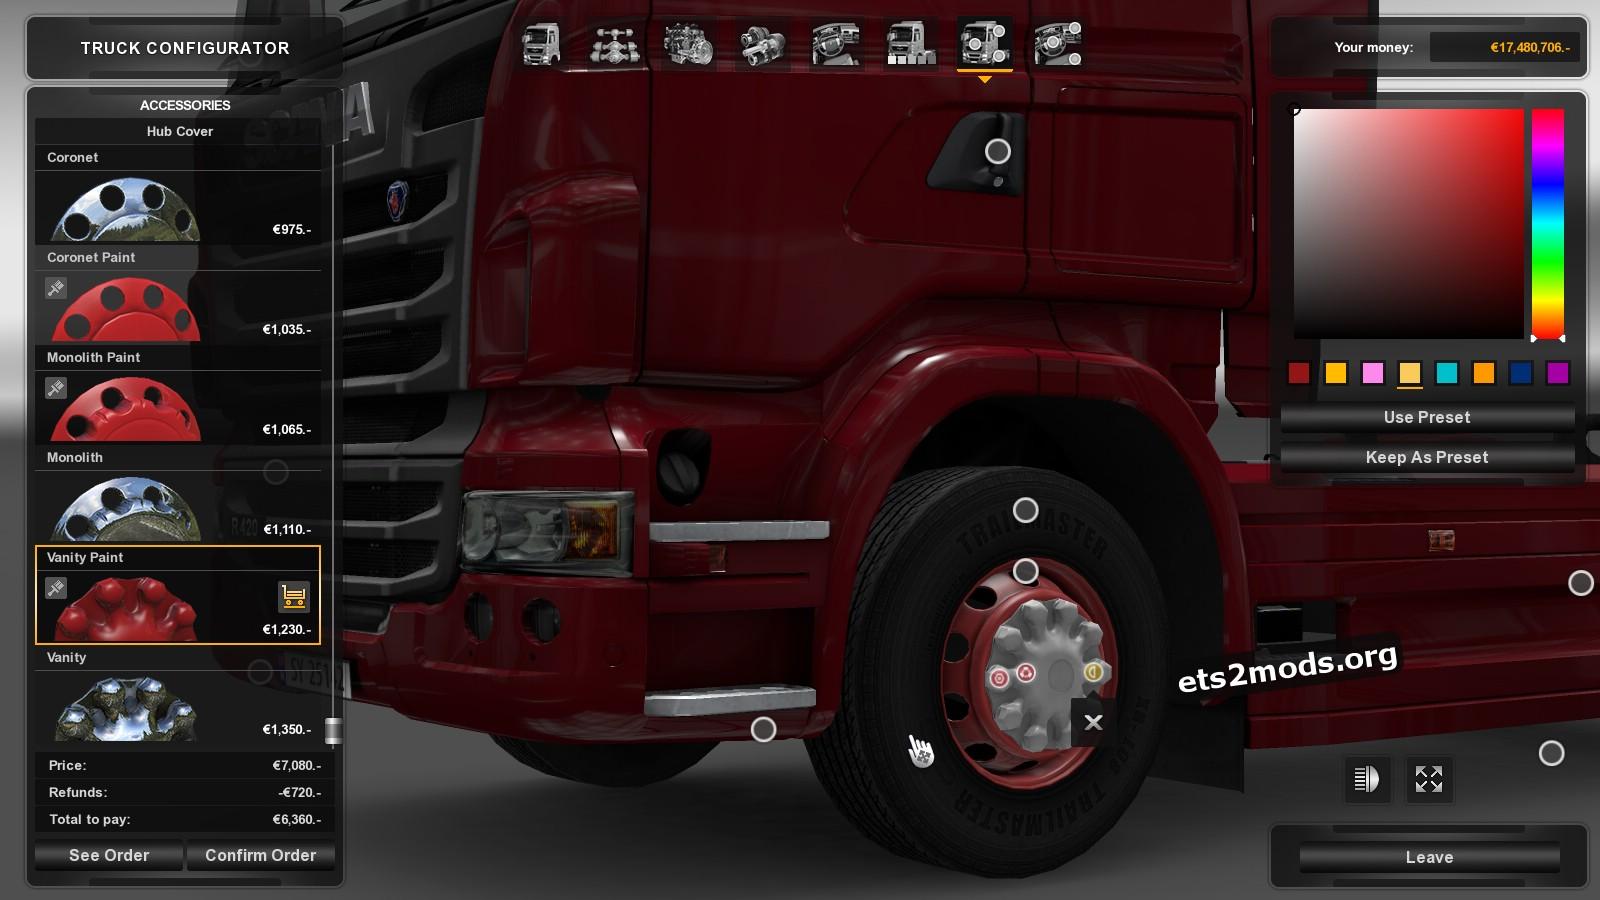 Wheels Mod - Turkis Job Frilly